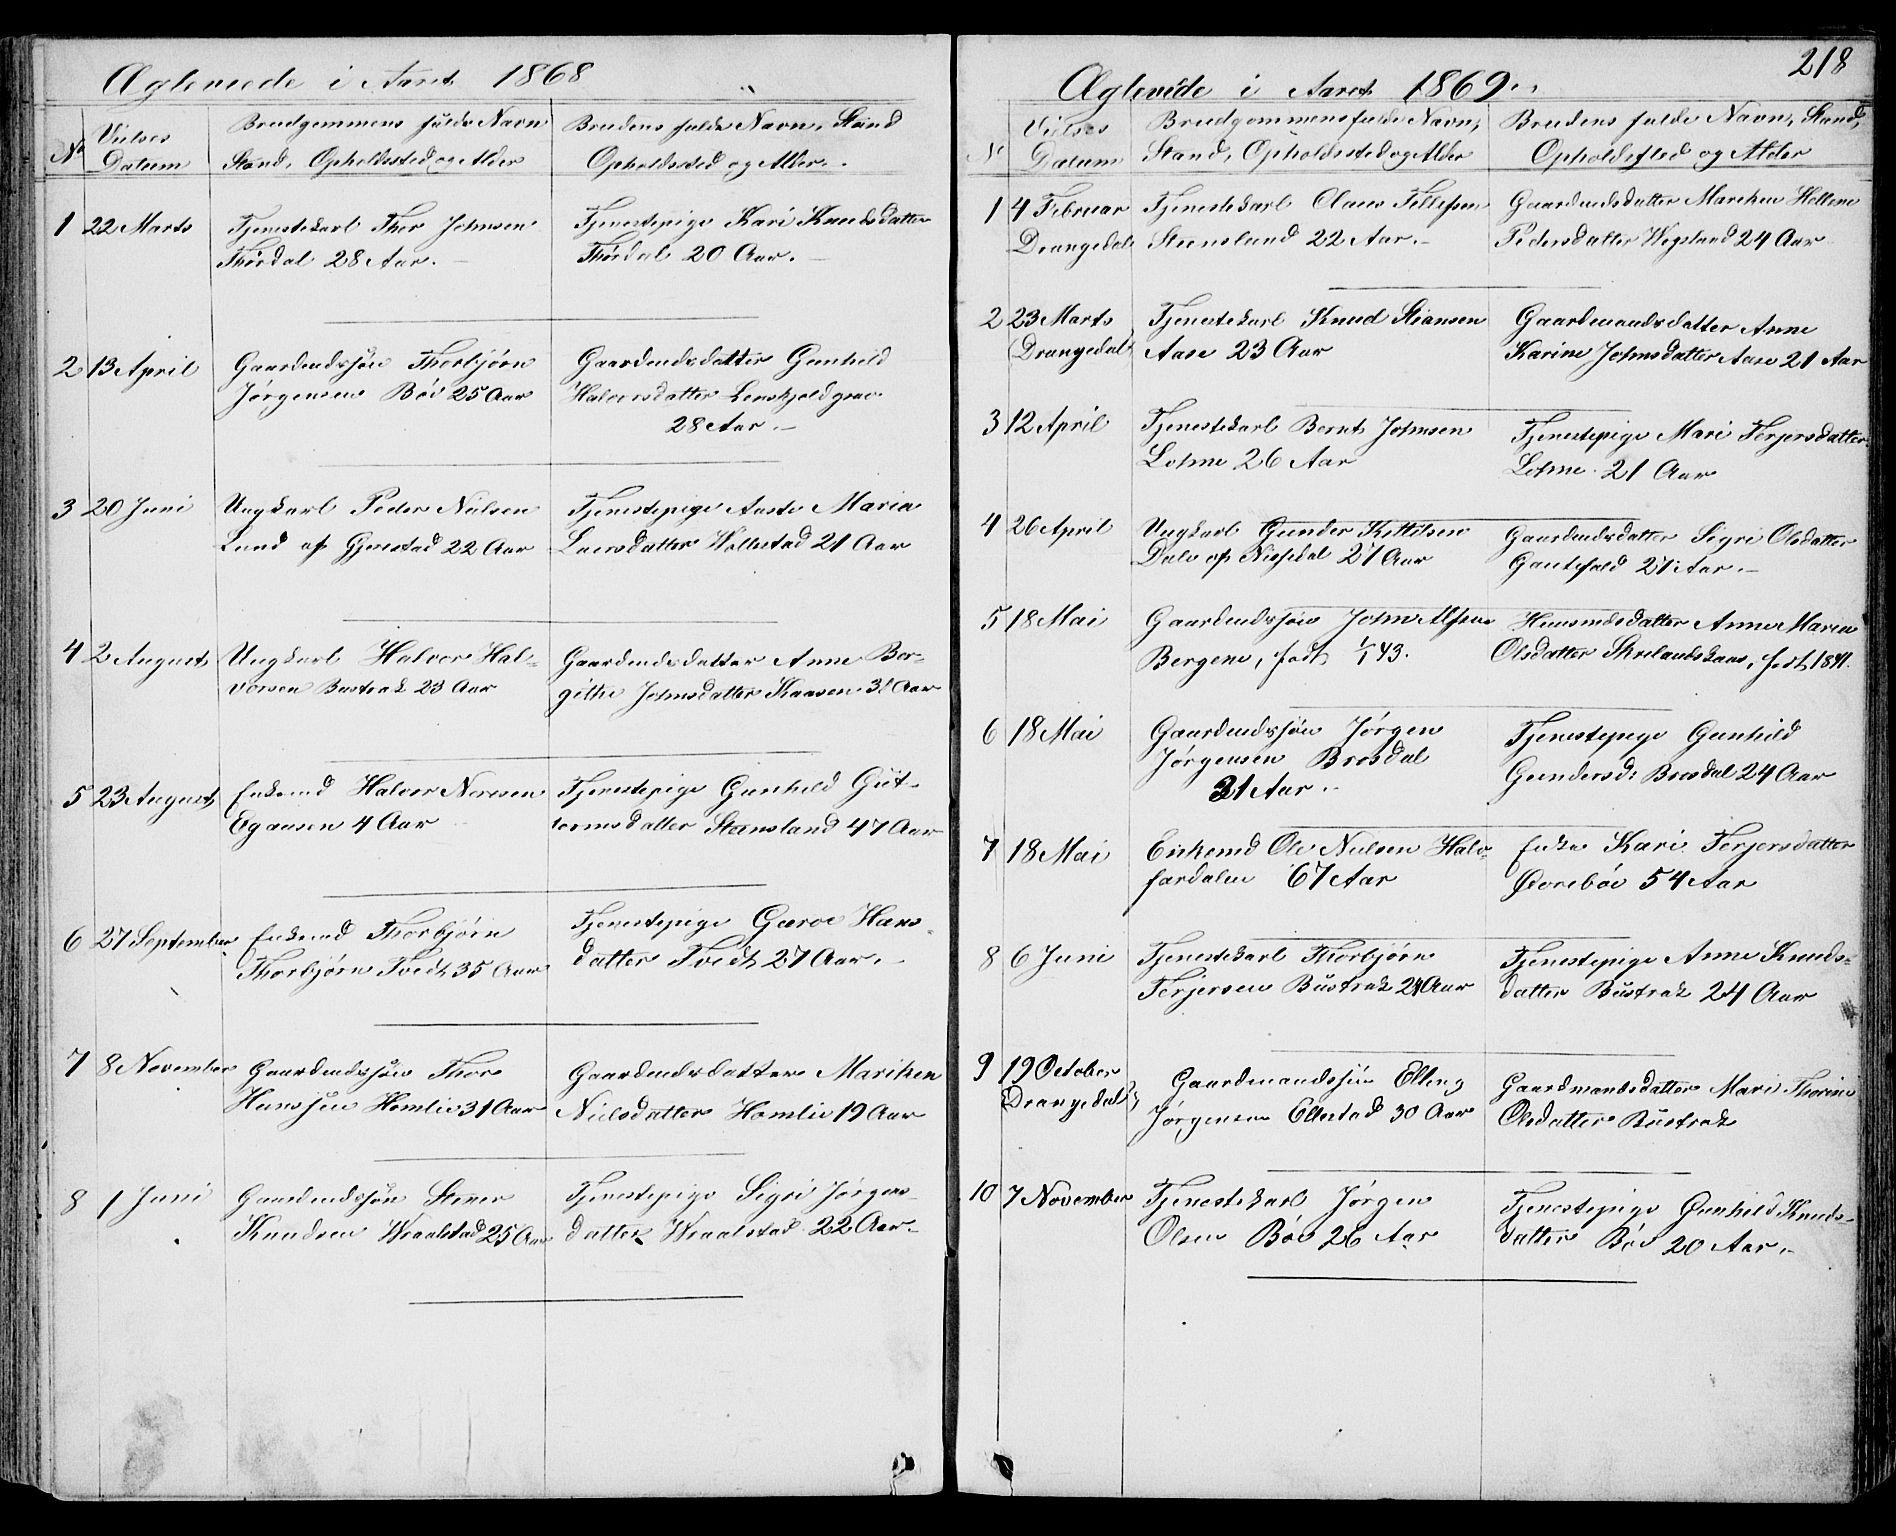 SAKO, Drangedal kirkebøker, G/Gb/L0001: Klokkerbok nr. II 1, 1856-1894, s. 218